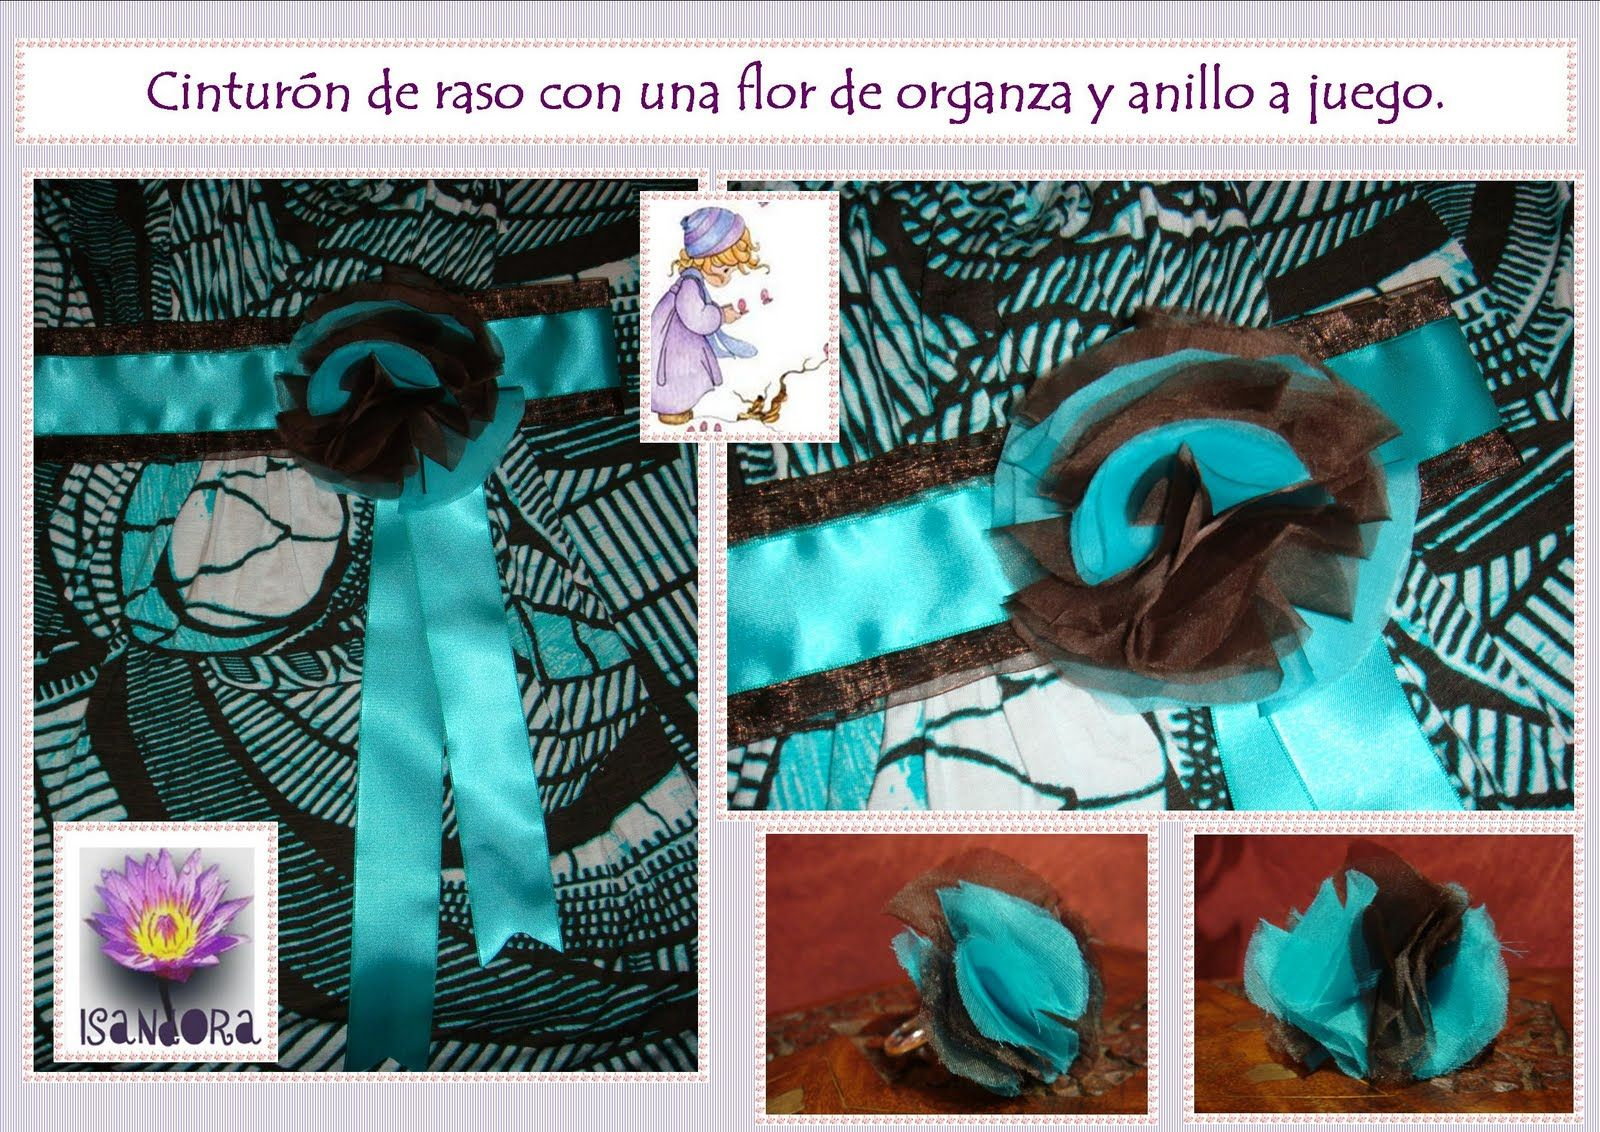 ISANDORA by MAFI: Cinturón fiesta